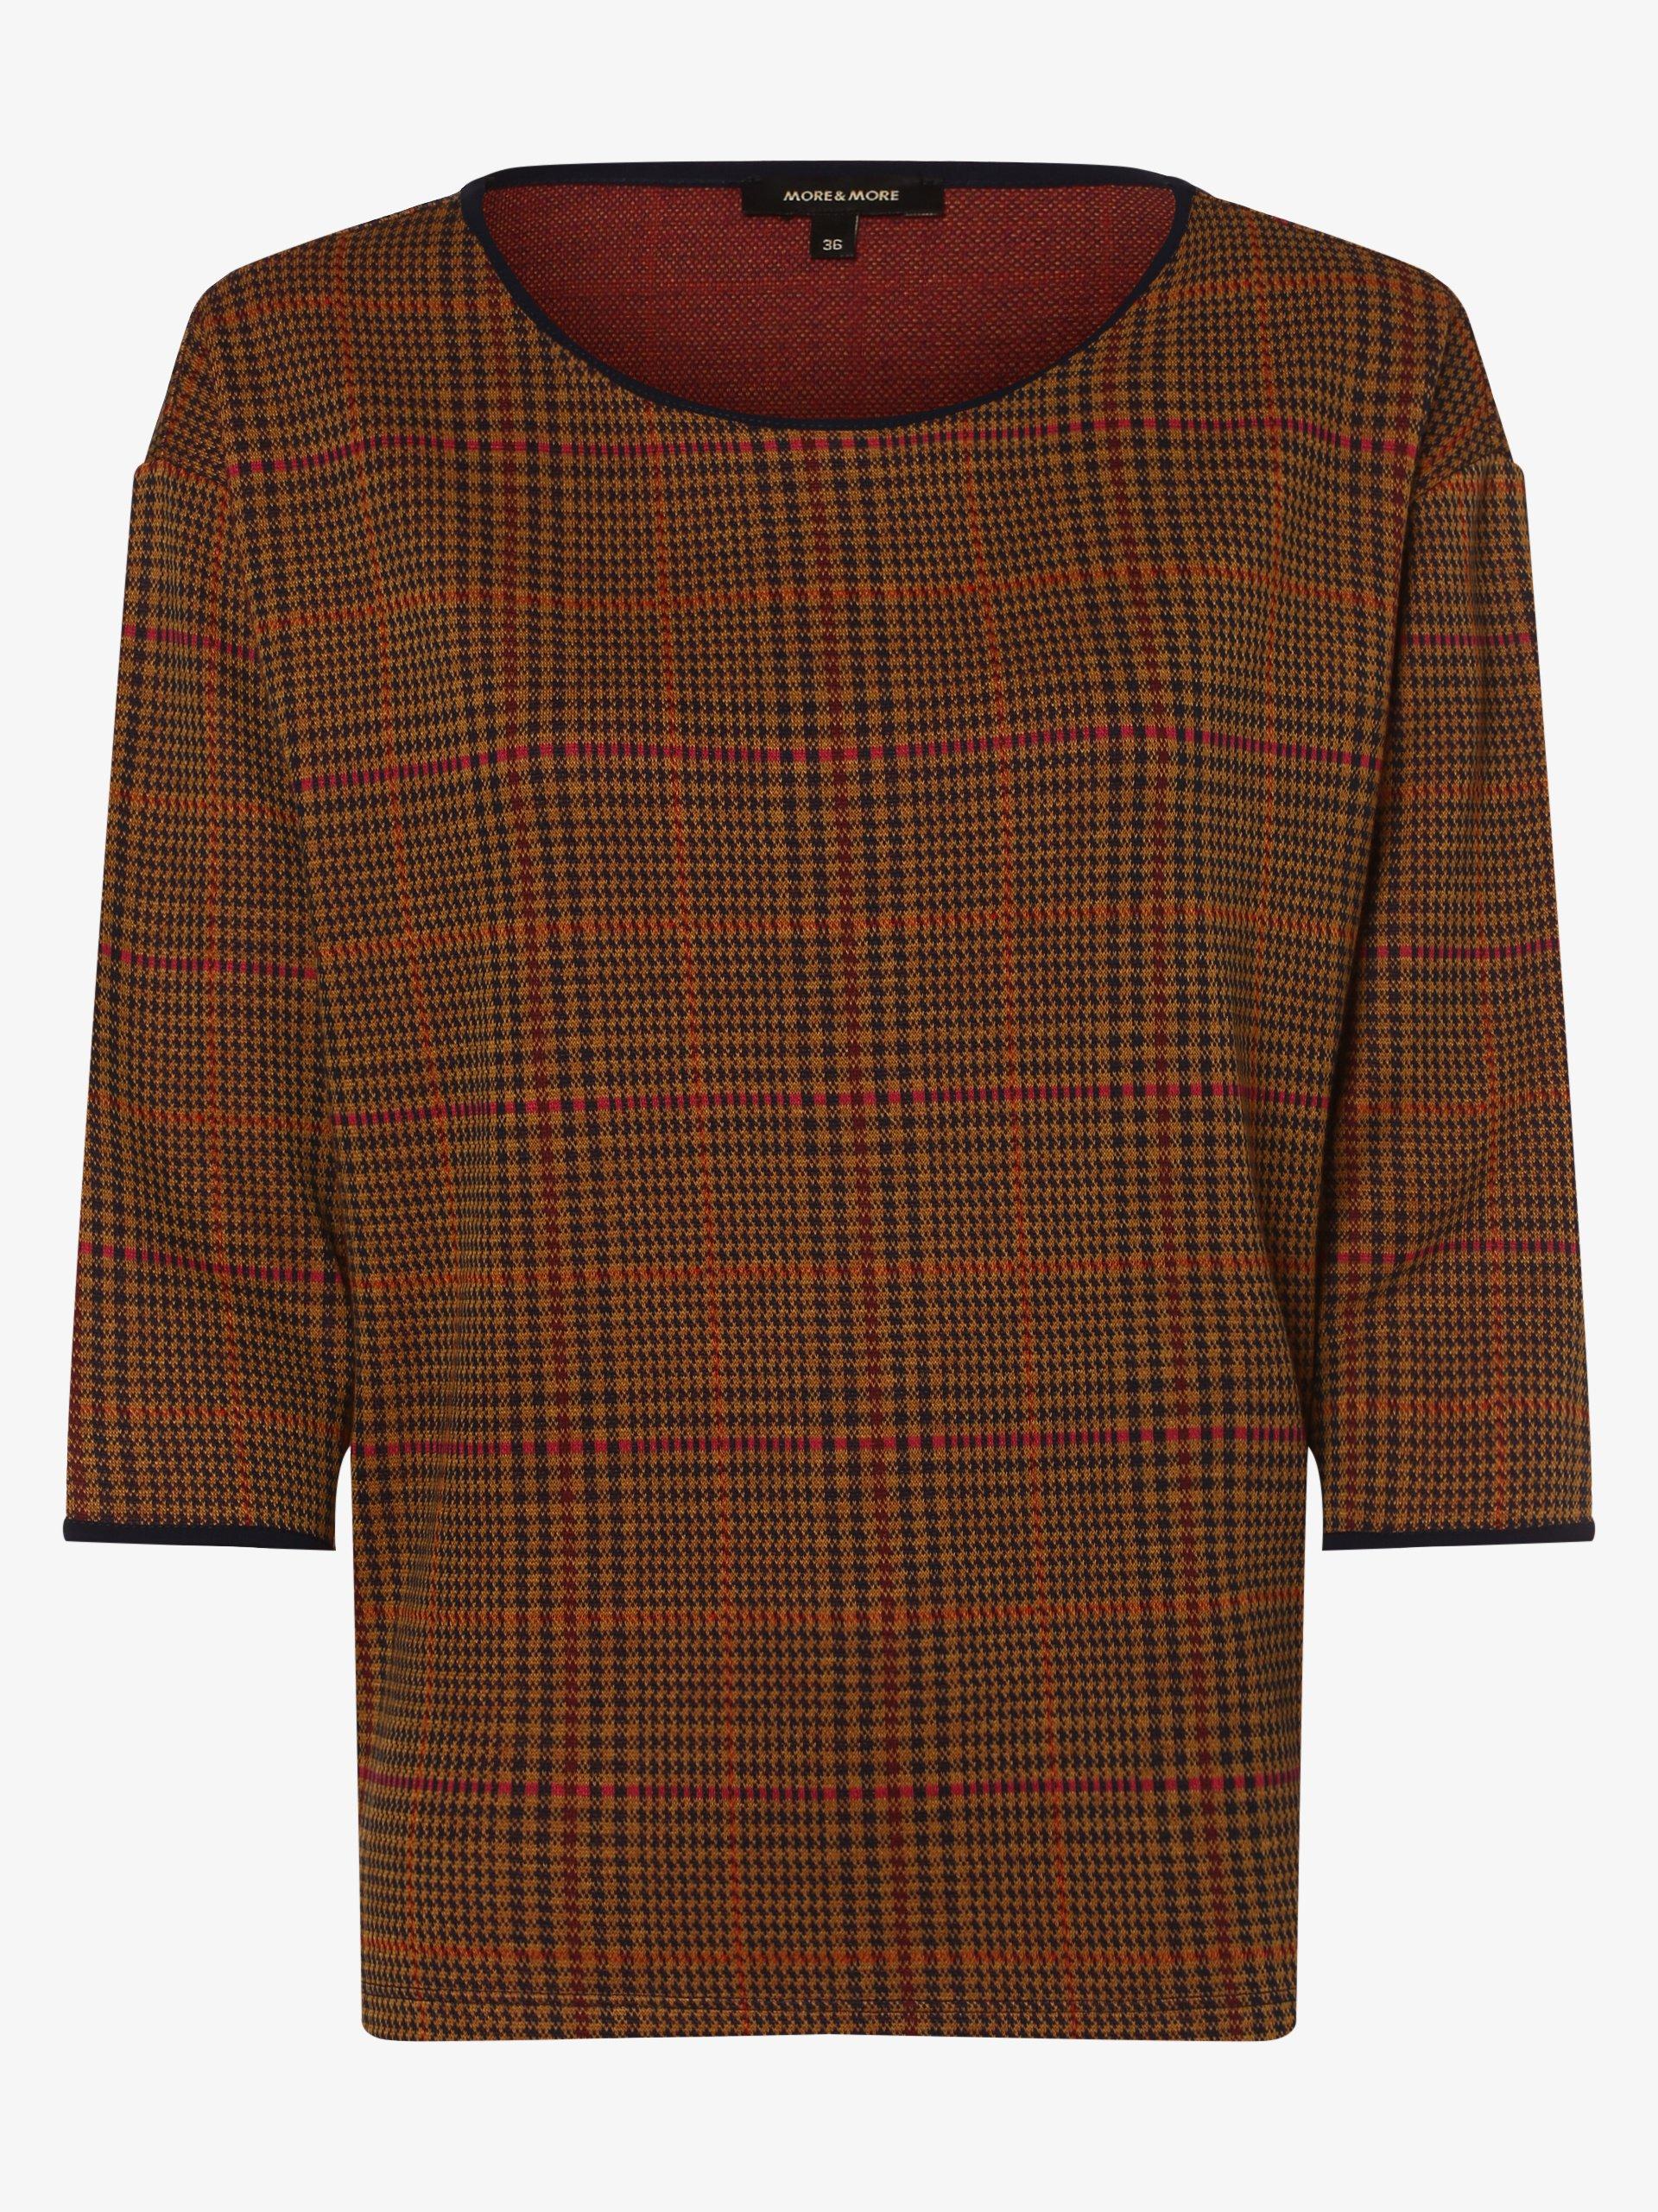 More & More Damen Shirt